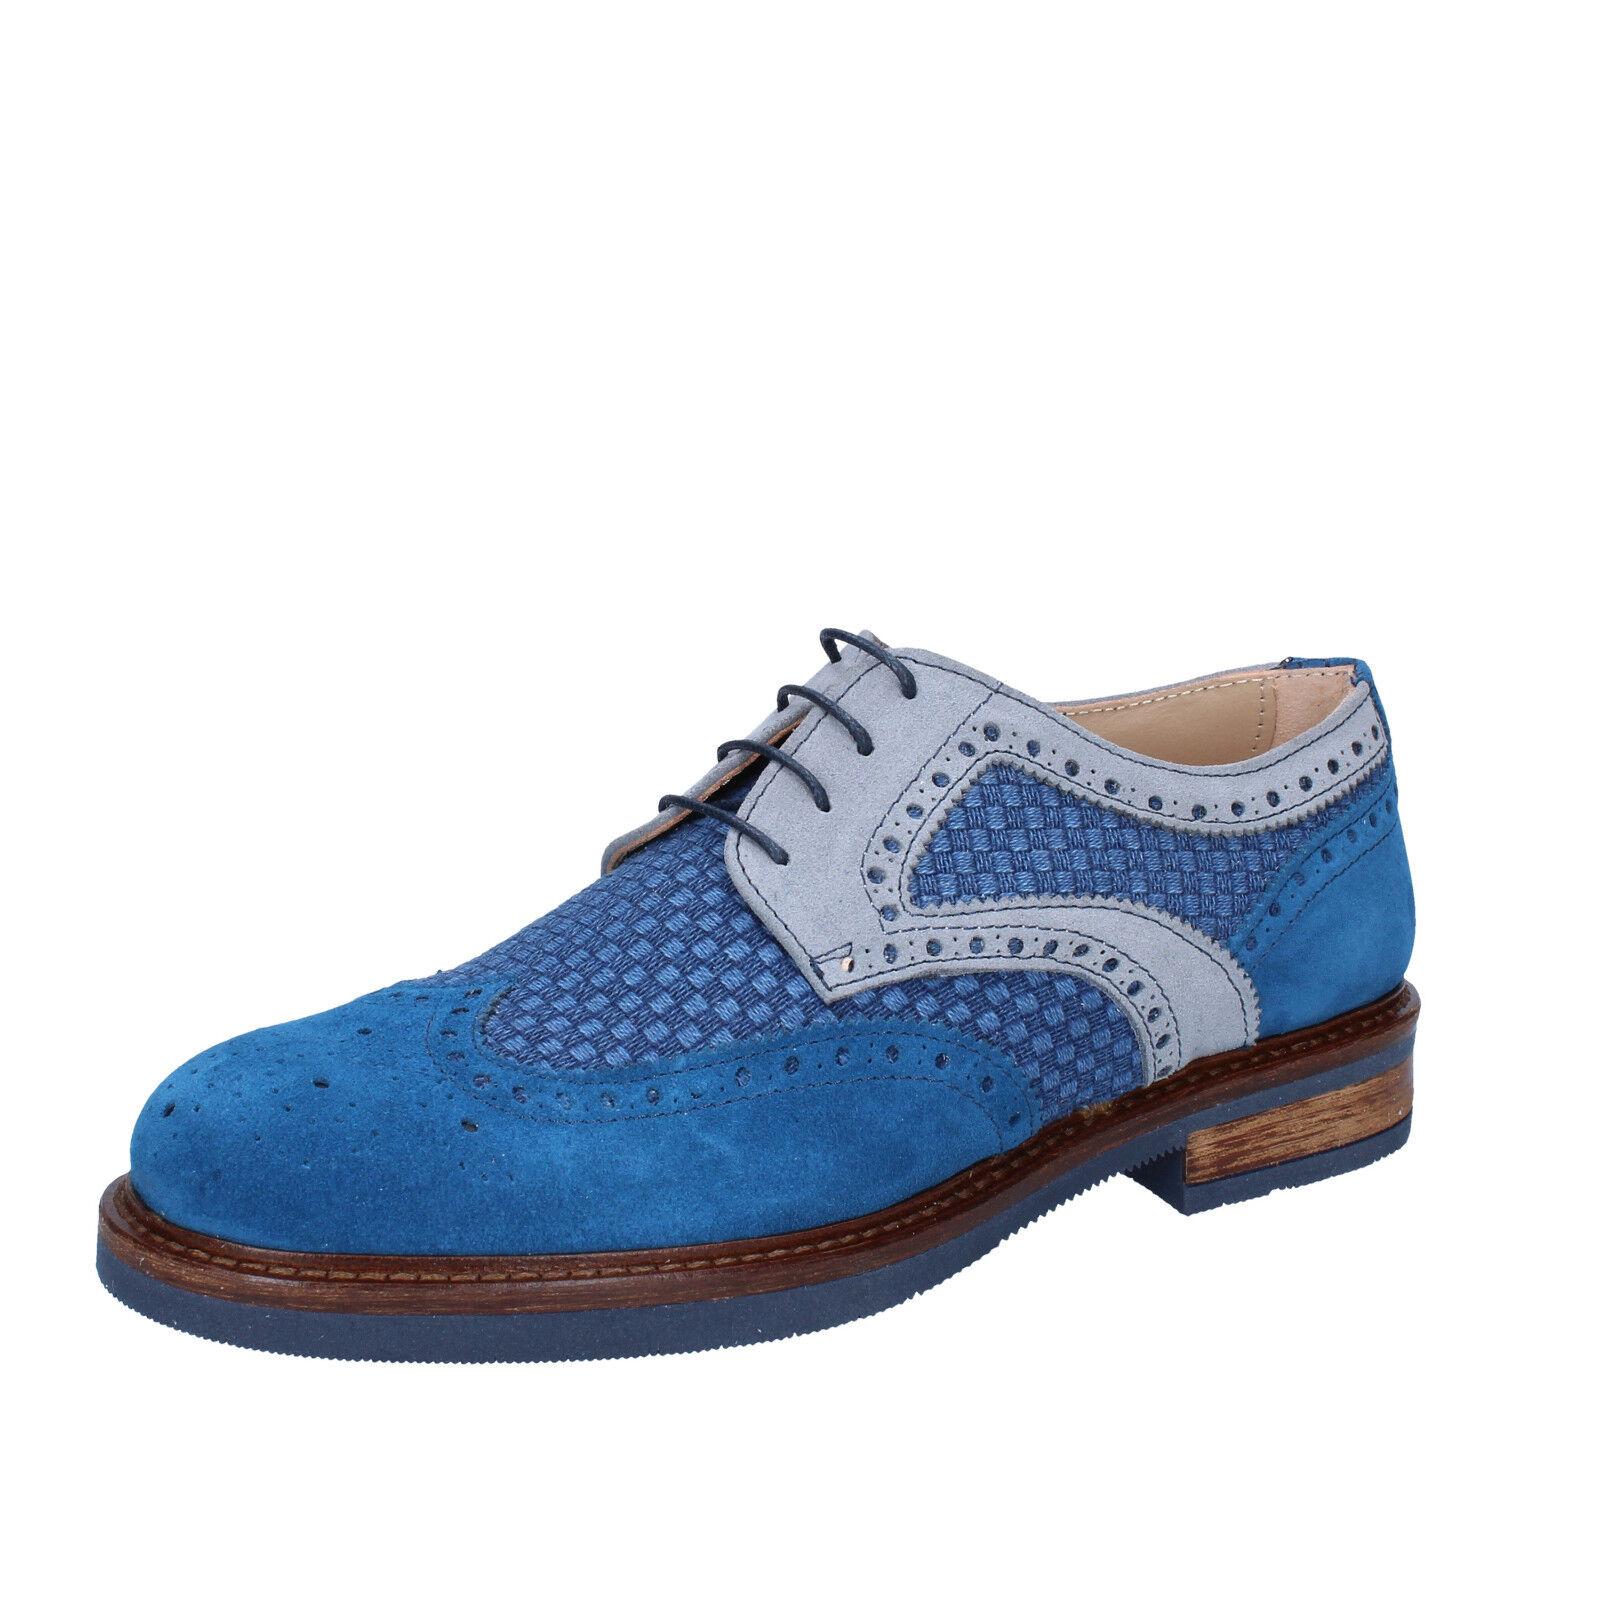 Scarpe casual da uomo  Scarpe uomo FDF shoes 41 UE ELEGANTE BLU GRIGIO CAMOSCIO TESSILE bz348-c